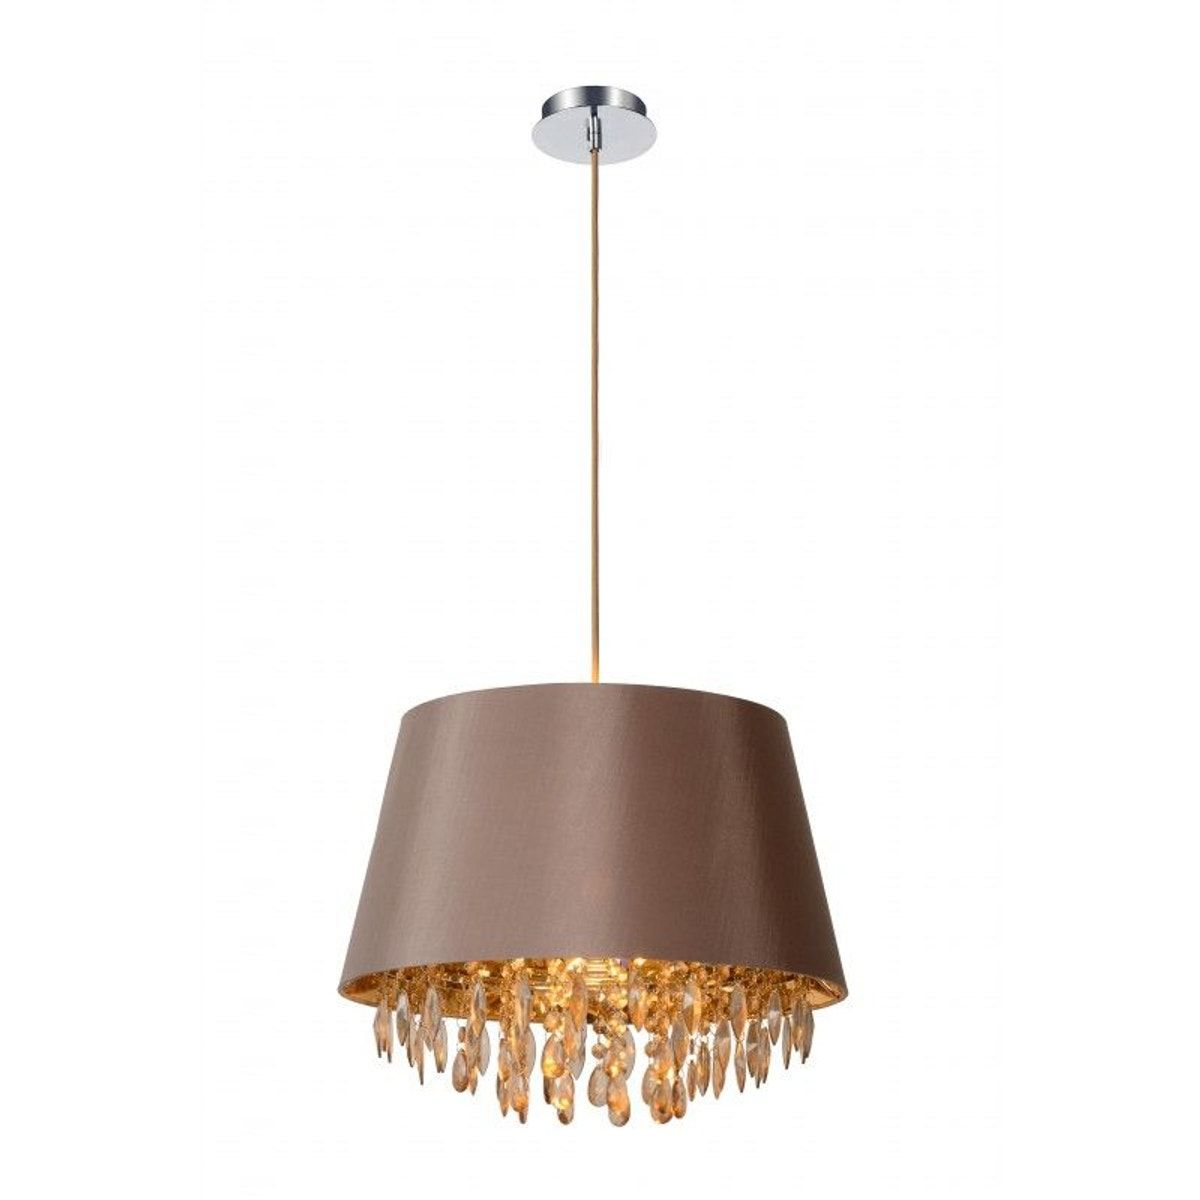 Suspension Dolti D45 cm | Lumières suspendus, Suspension